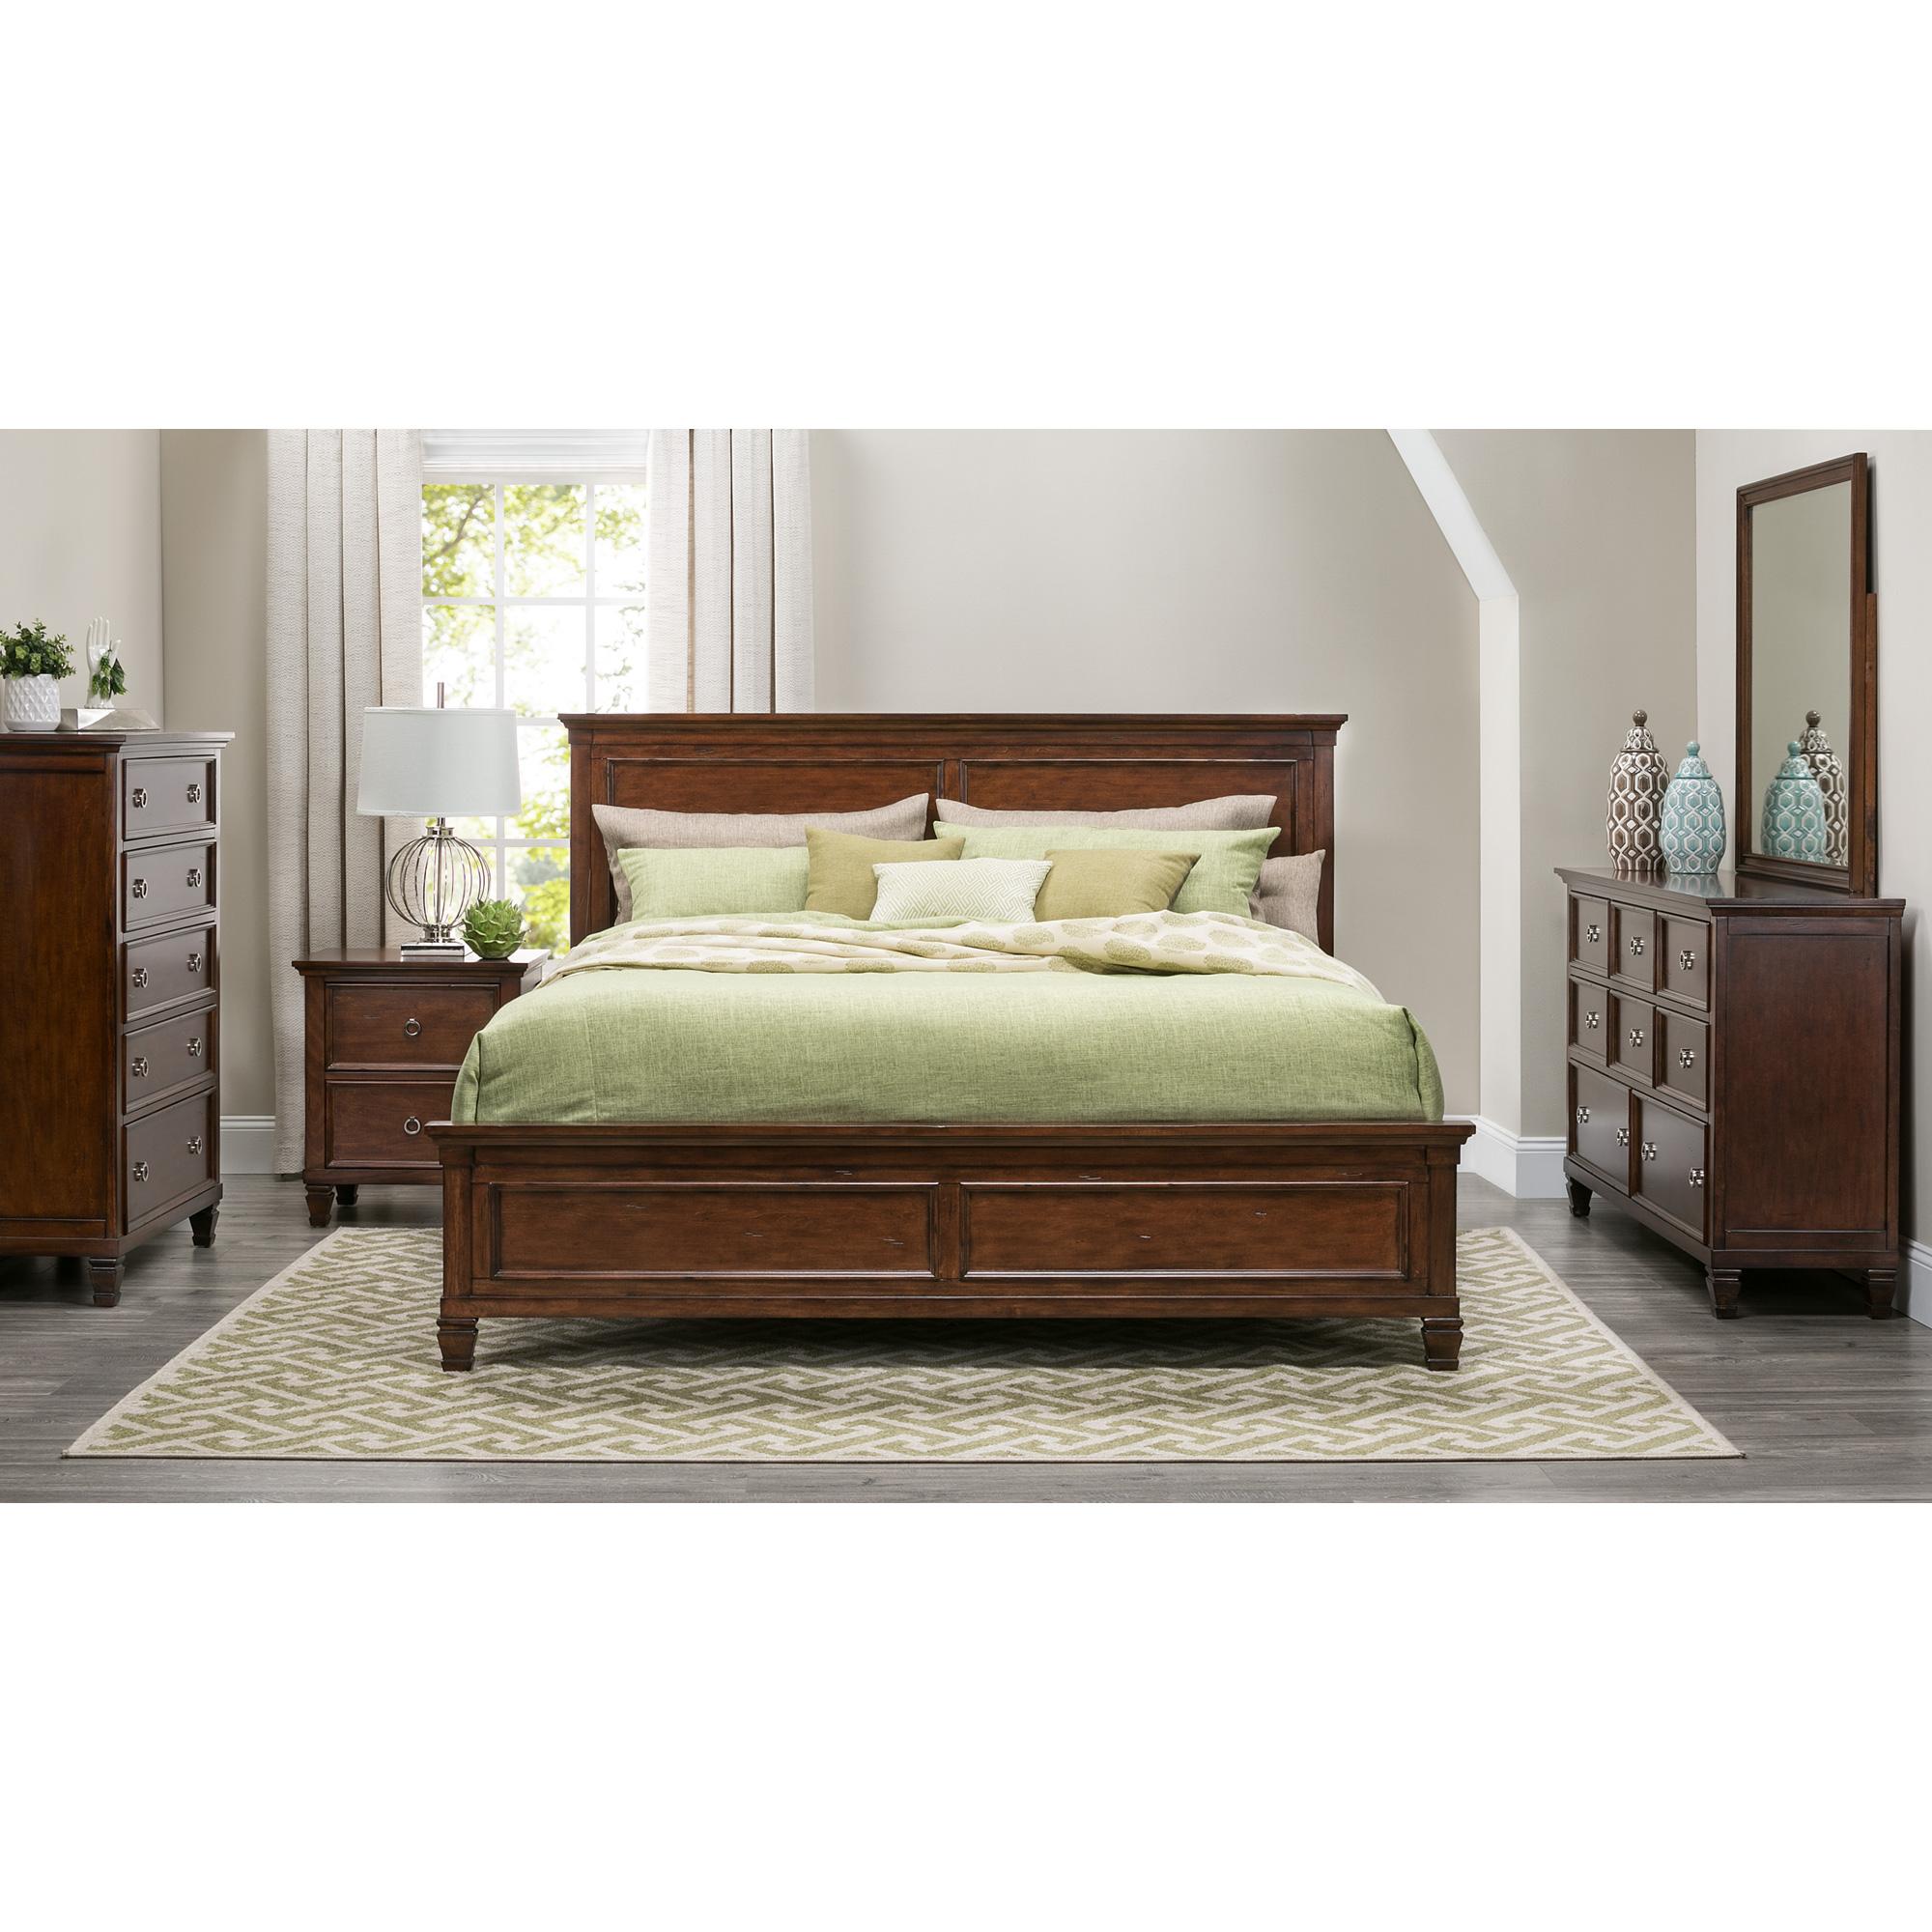 New Classic | Persia II Brown Cherry California King 4 Piece Room Group Bedroom Set